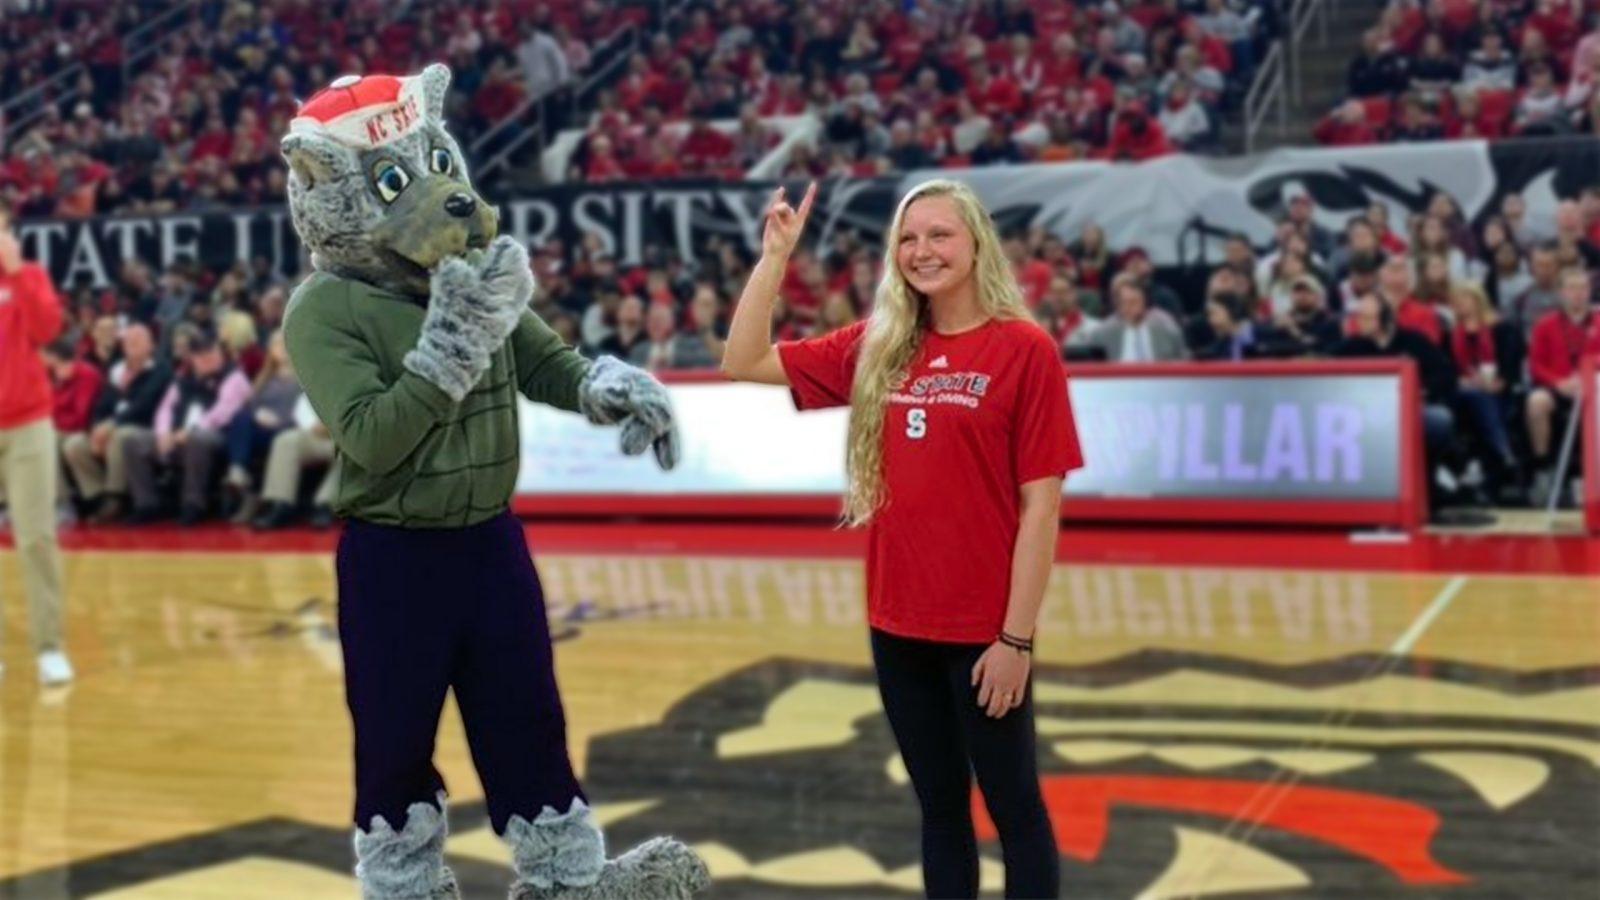 Maddie Morello | Caterpillar Scholar-Athlete | January 12, 2019